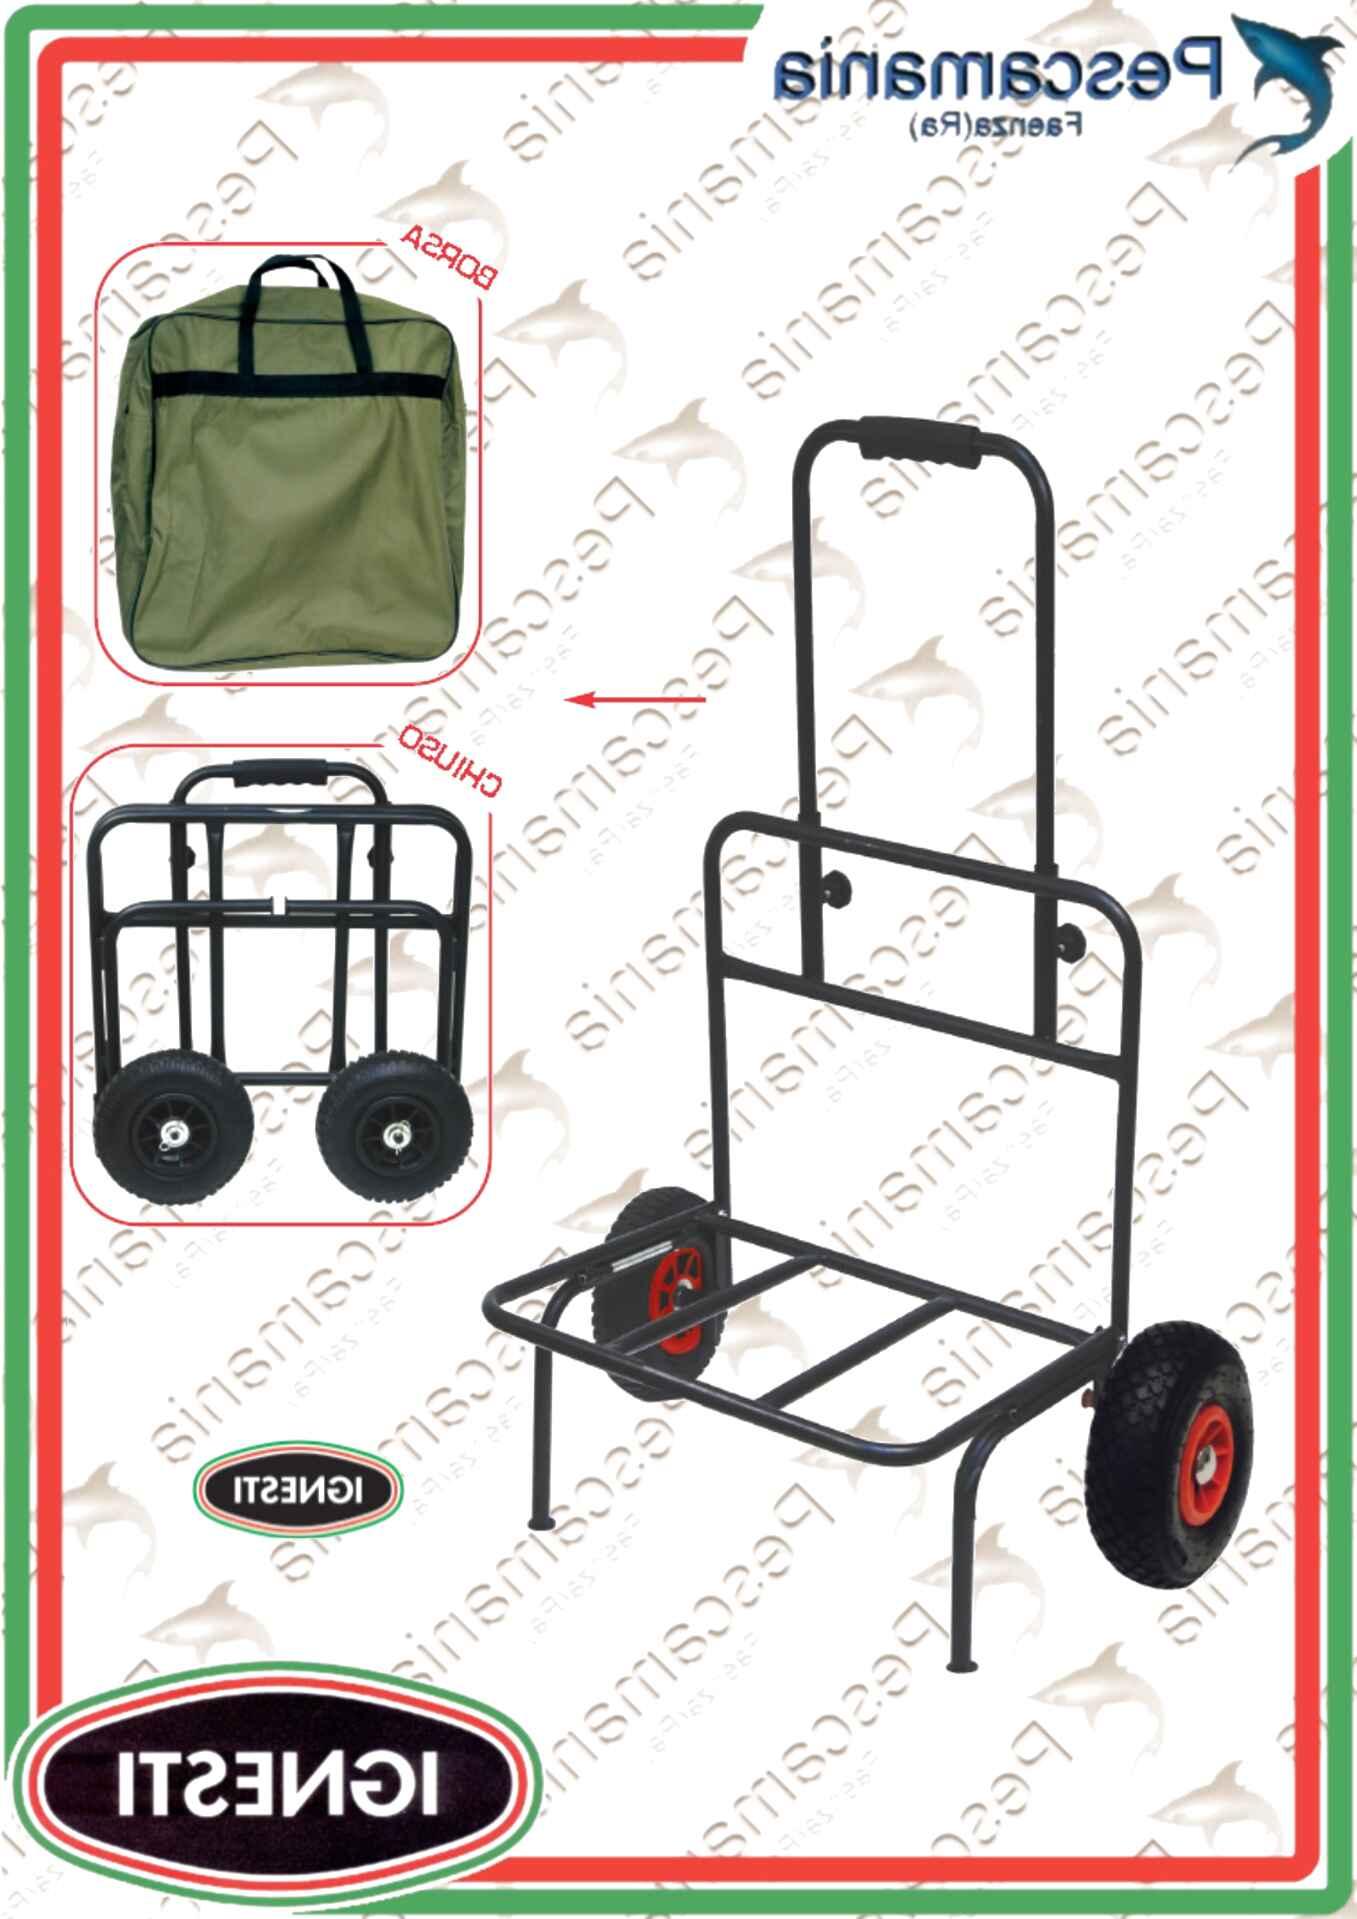 carrello carpfishing usato